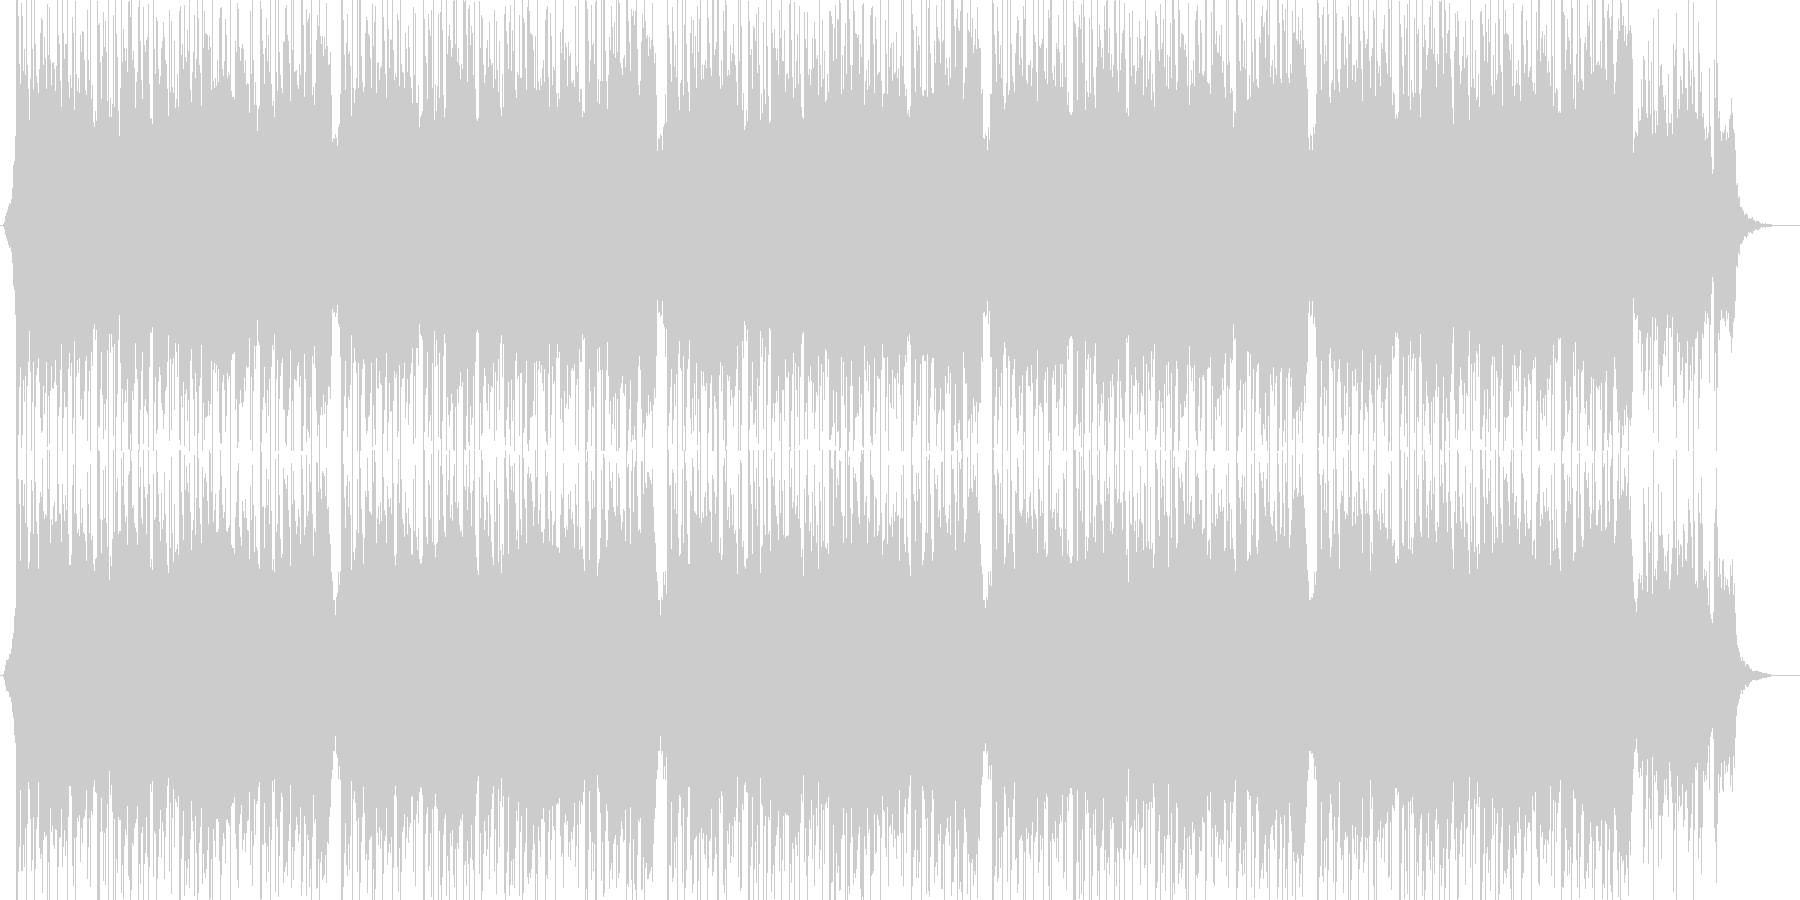 Dramatic development _ Adult mysterious's unreproduced waveform